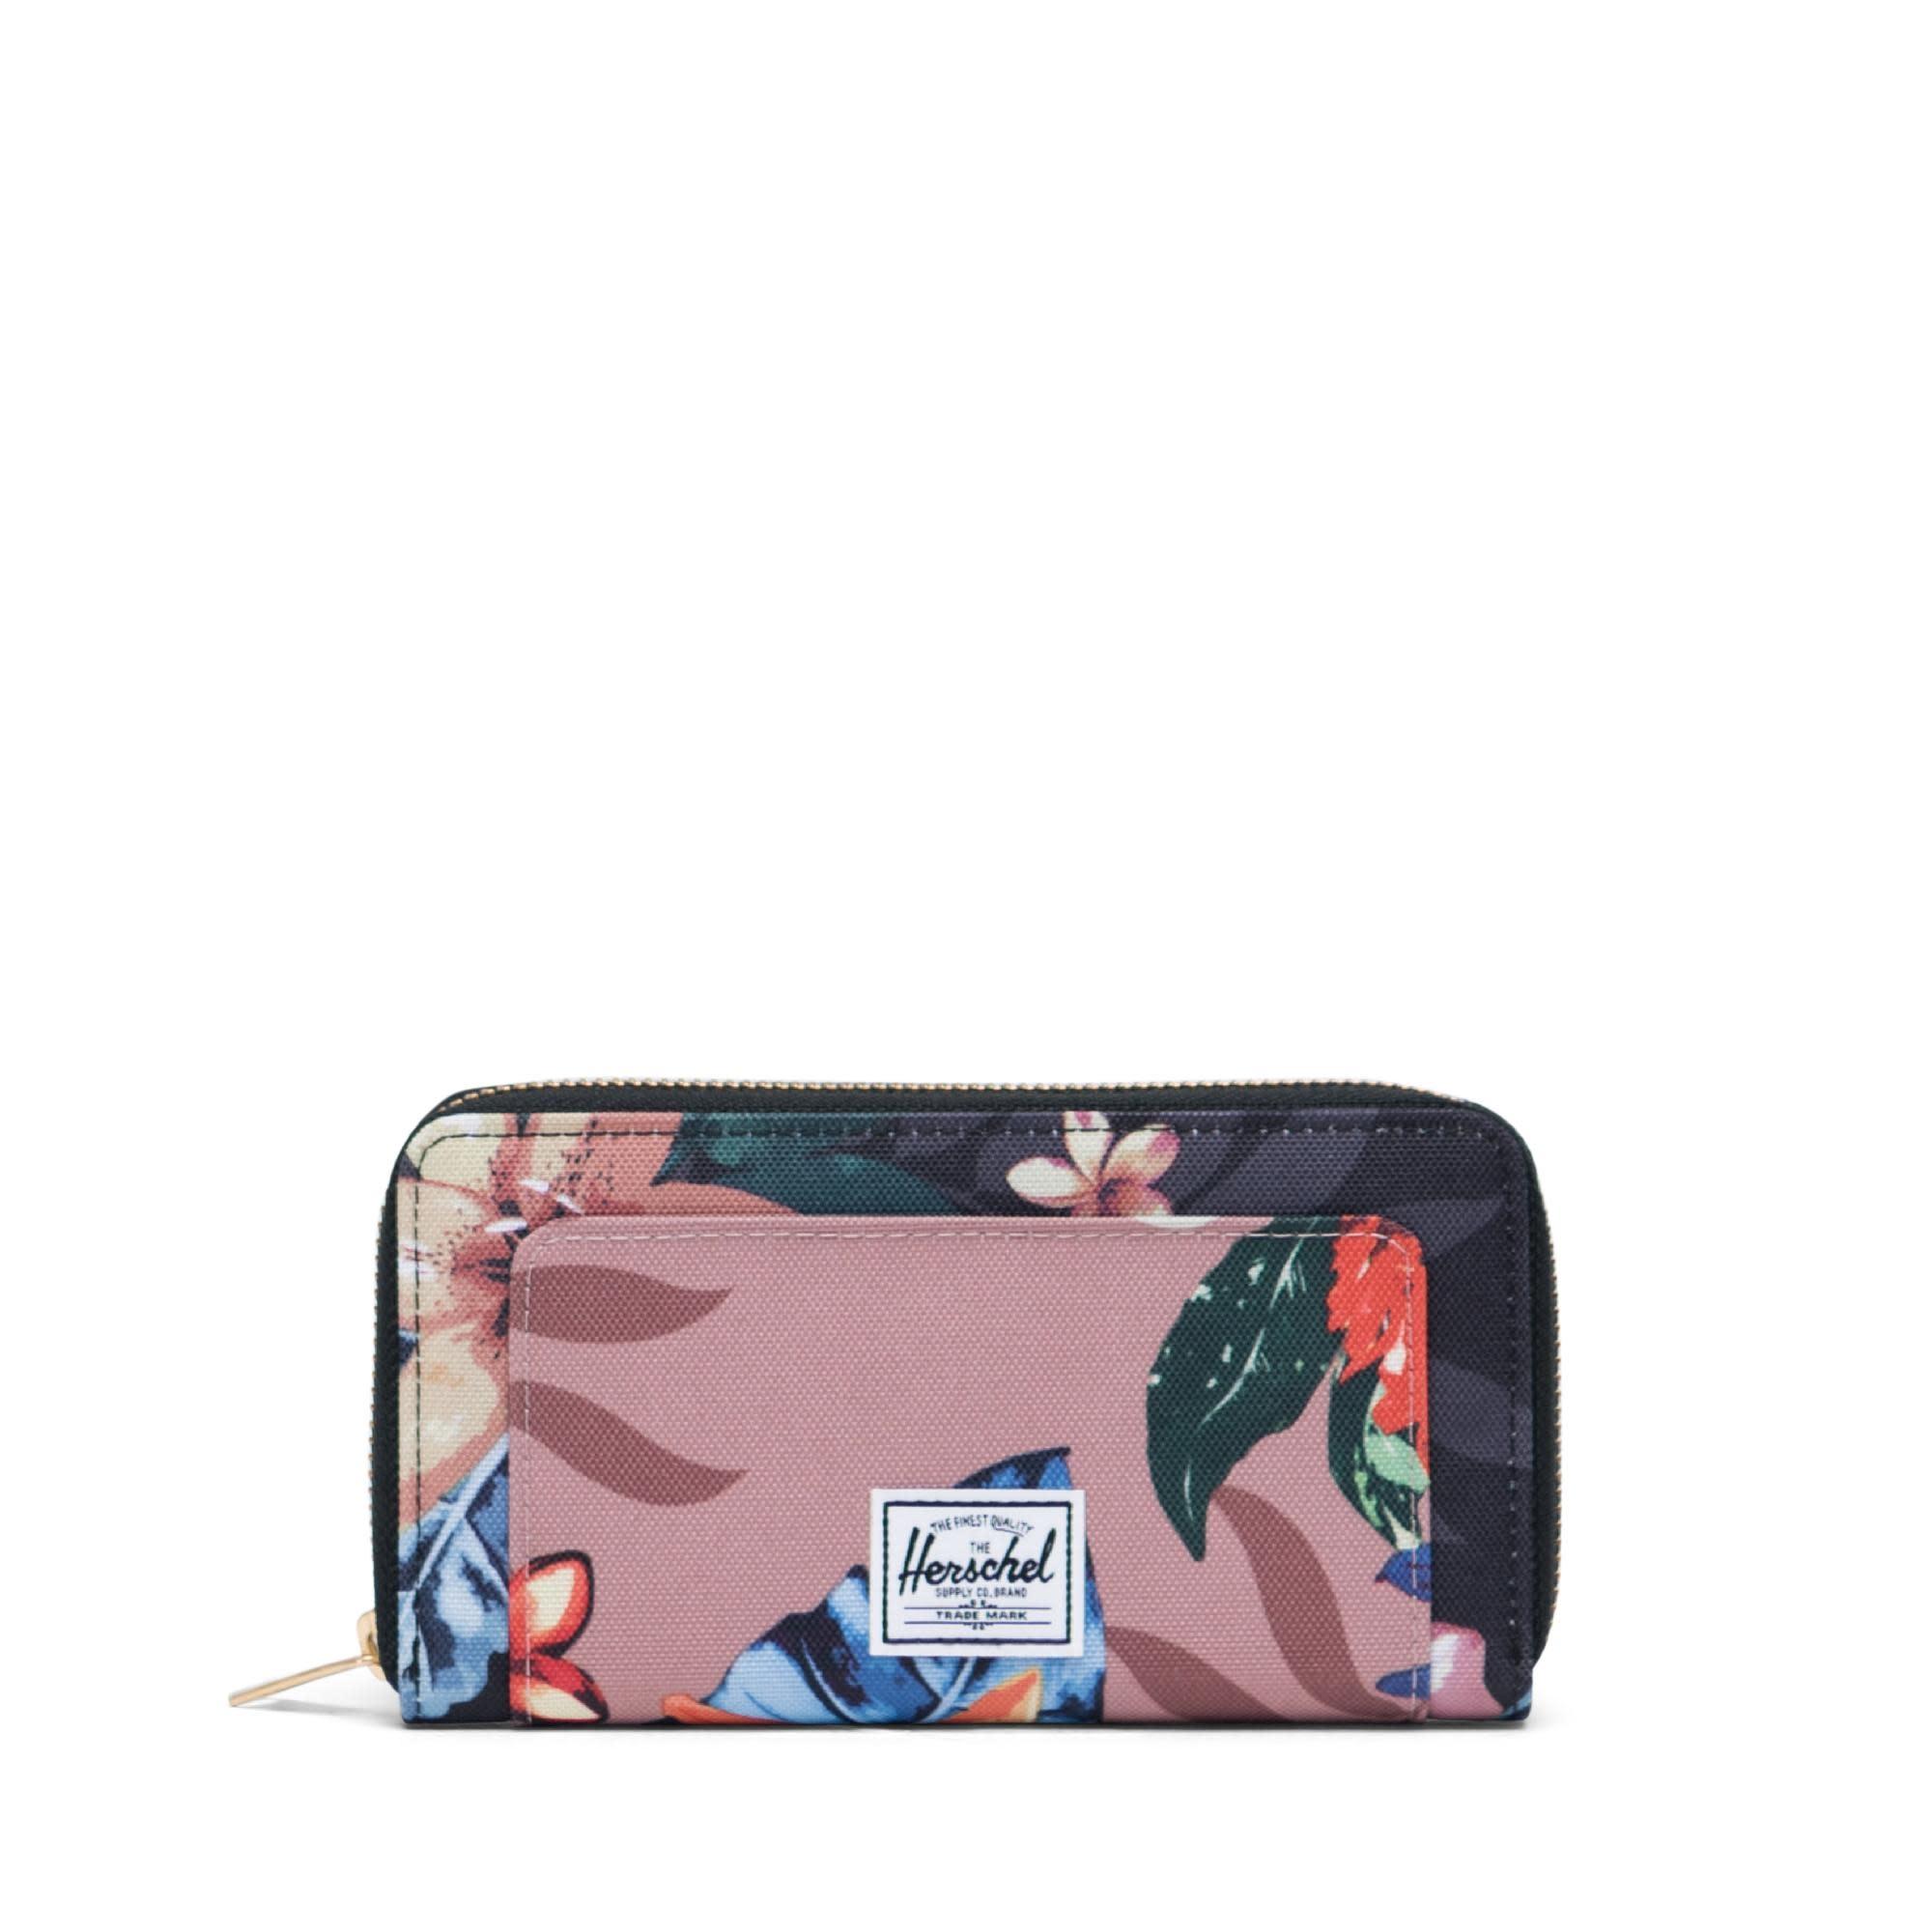 Herschel Supply Co. Herschel Thomas Wallet - Summer Floral Black/Summer Floral Ash Rose